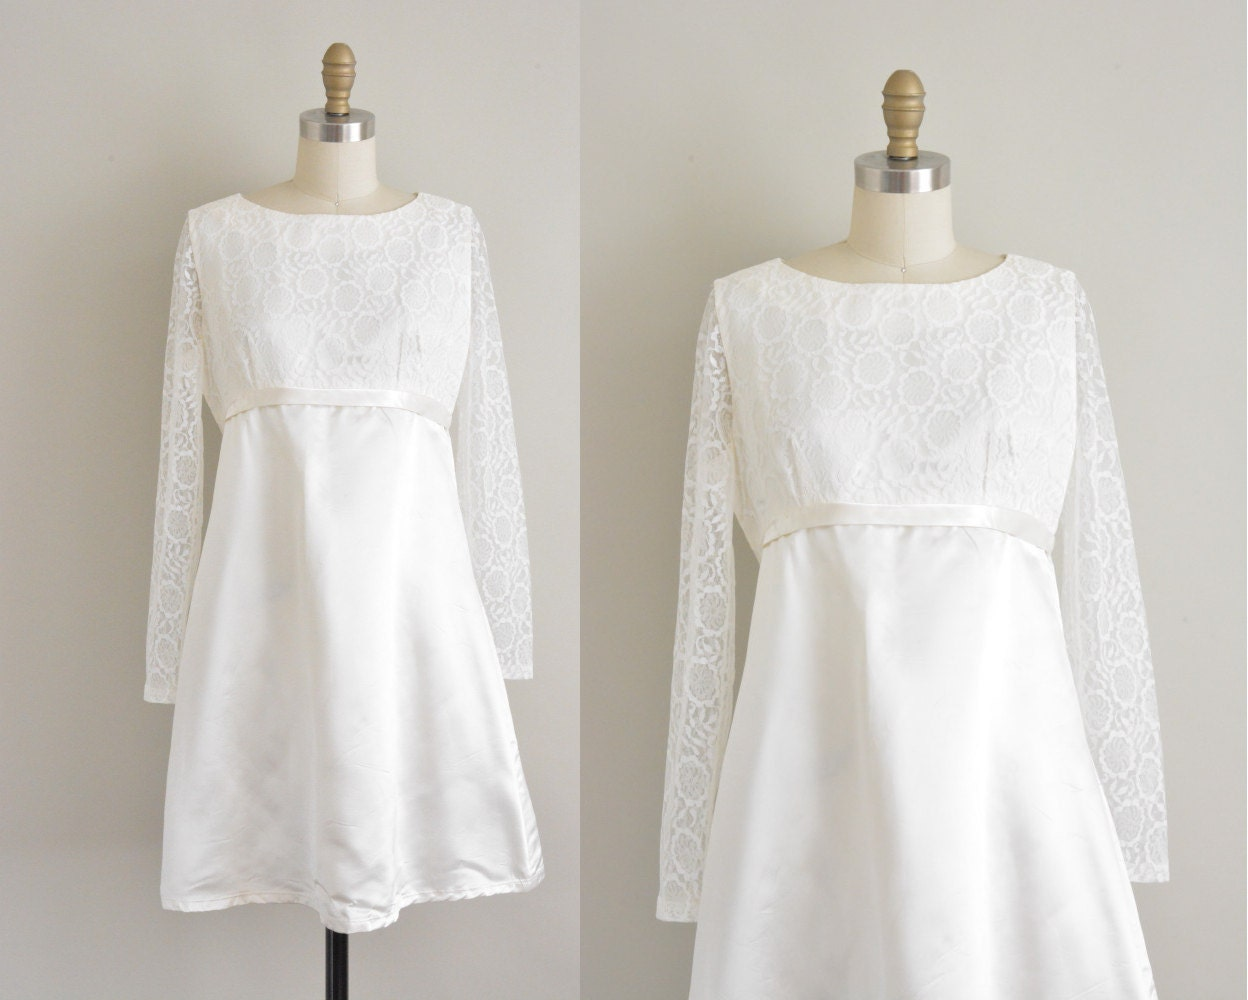 Classic Wedding Dress Satin: Vintage 1960s White Satin Wedding Dress / 60s Satin And Lace